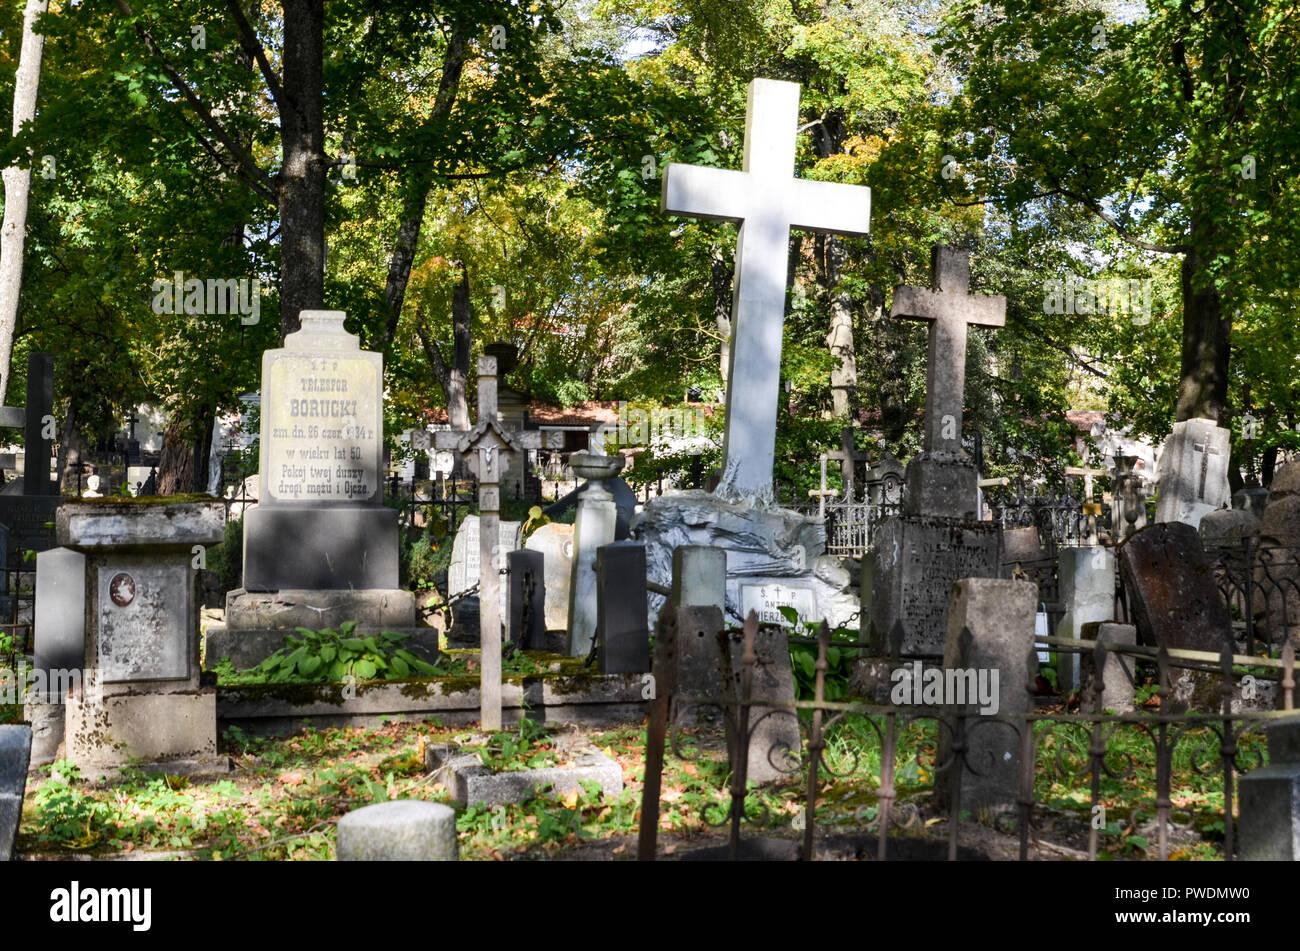 Bernardine Cemetery in Uzupis, Vilnius, Lithuania - Stock Image